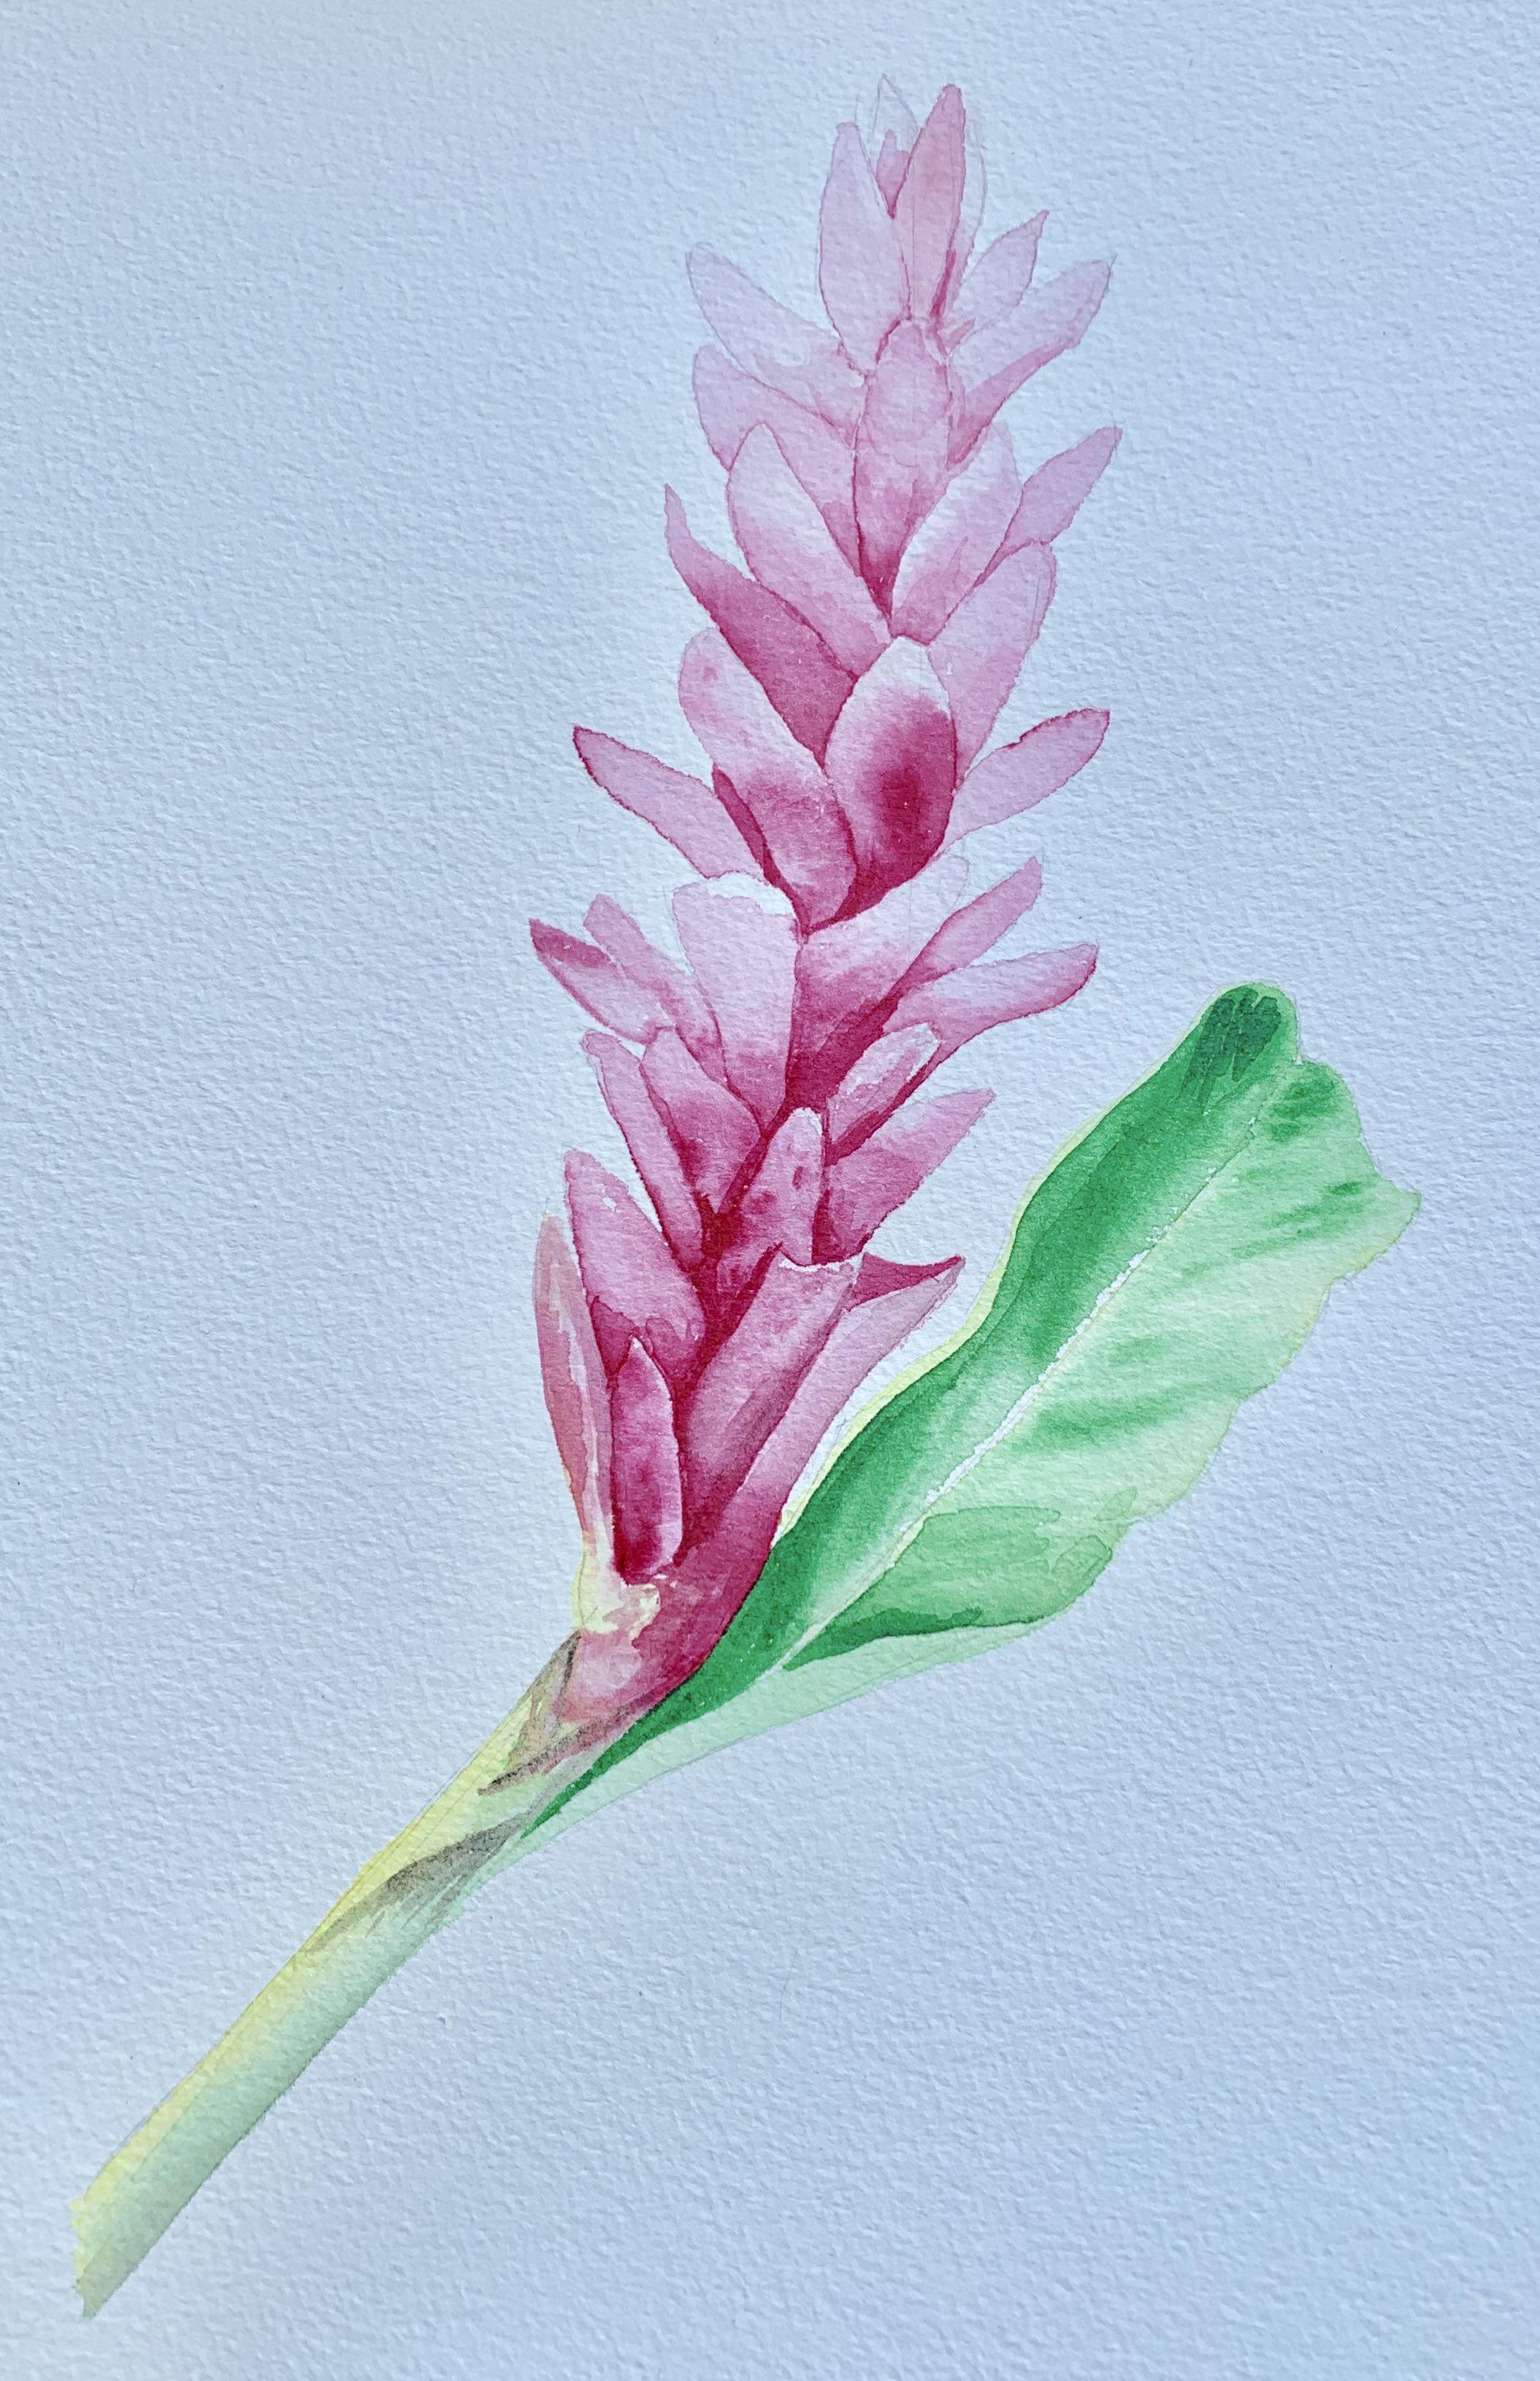 Ginger Flower Watercolor Instagram Caramiyamaui Ginger Flower Watercolor Flowers Watercolor